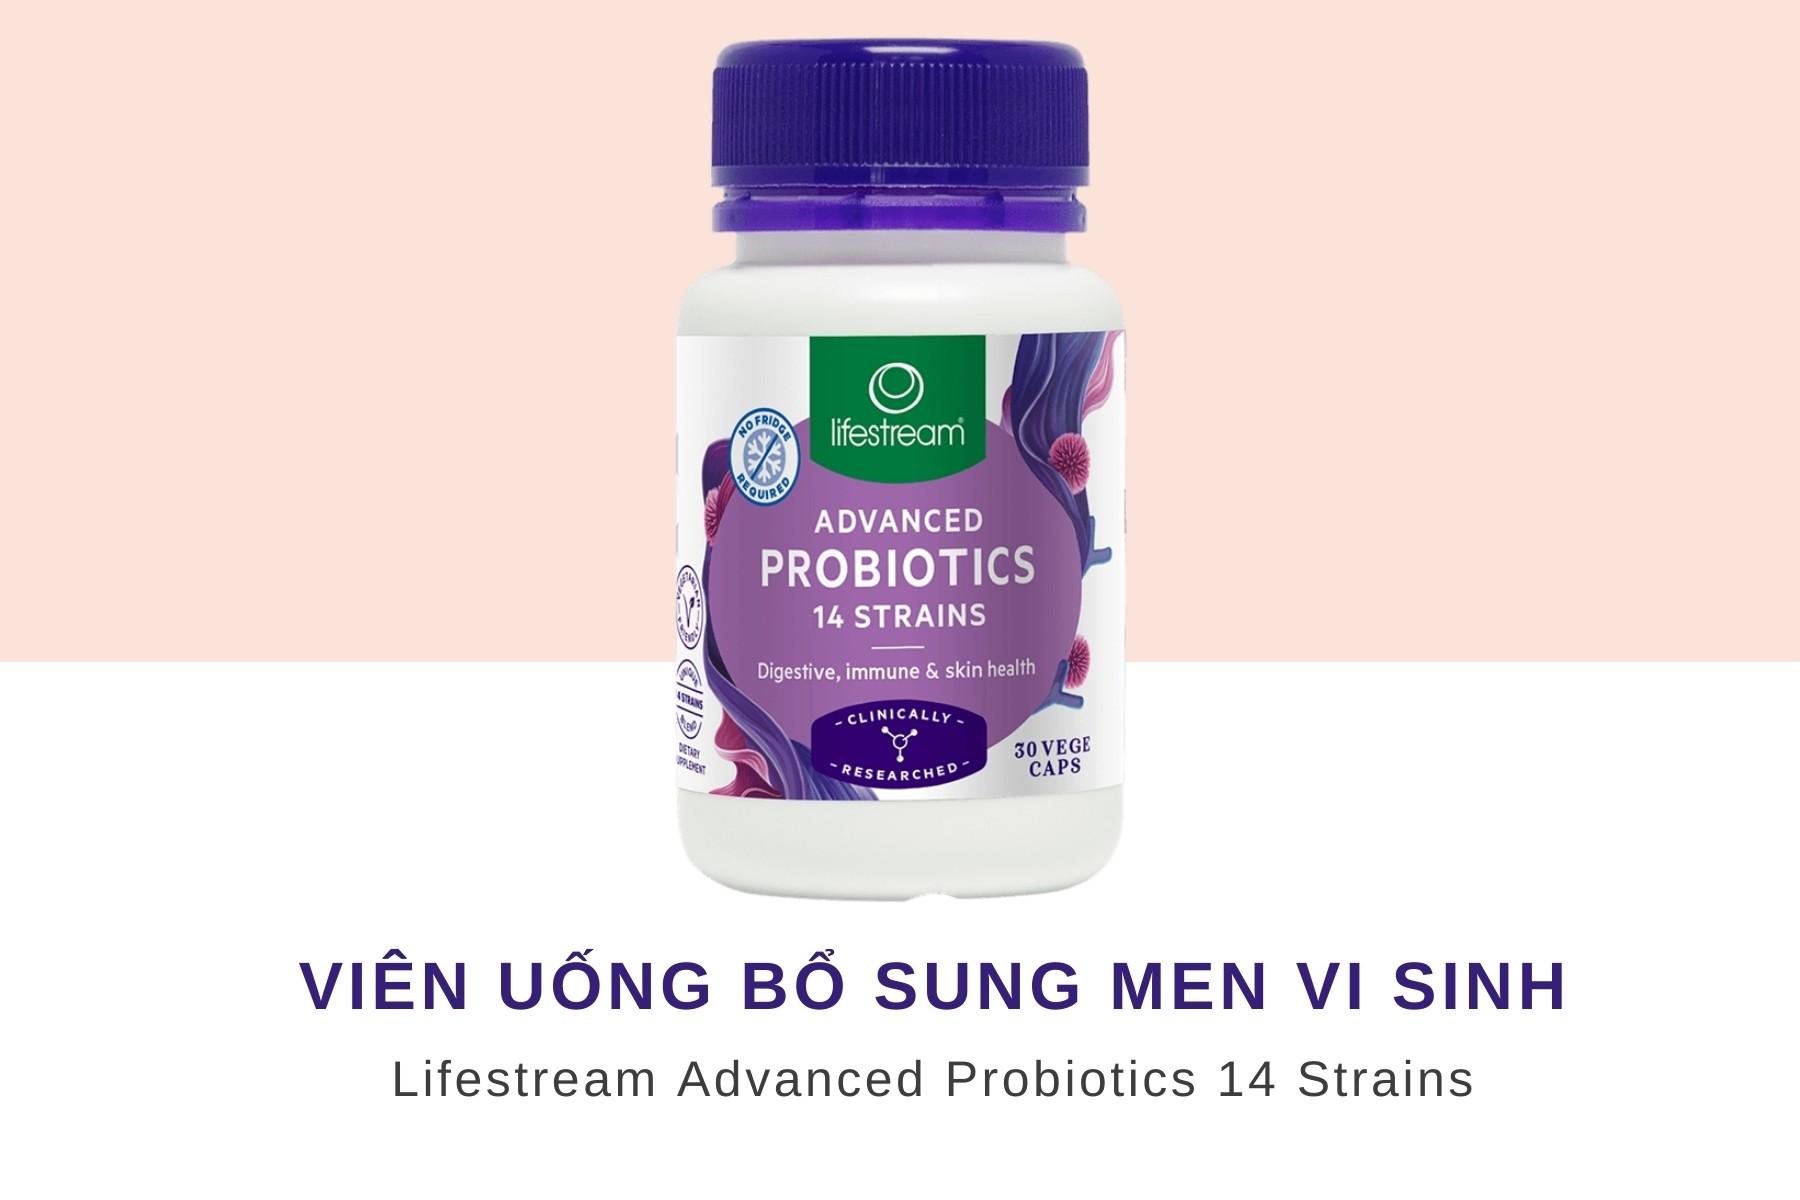 Lifestream Advanced Probiotics